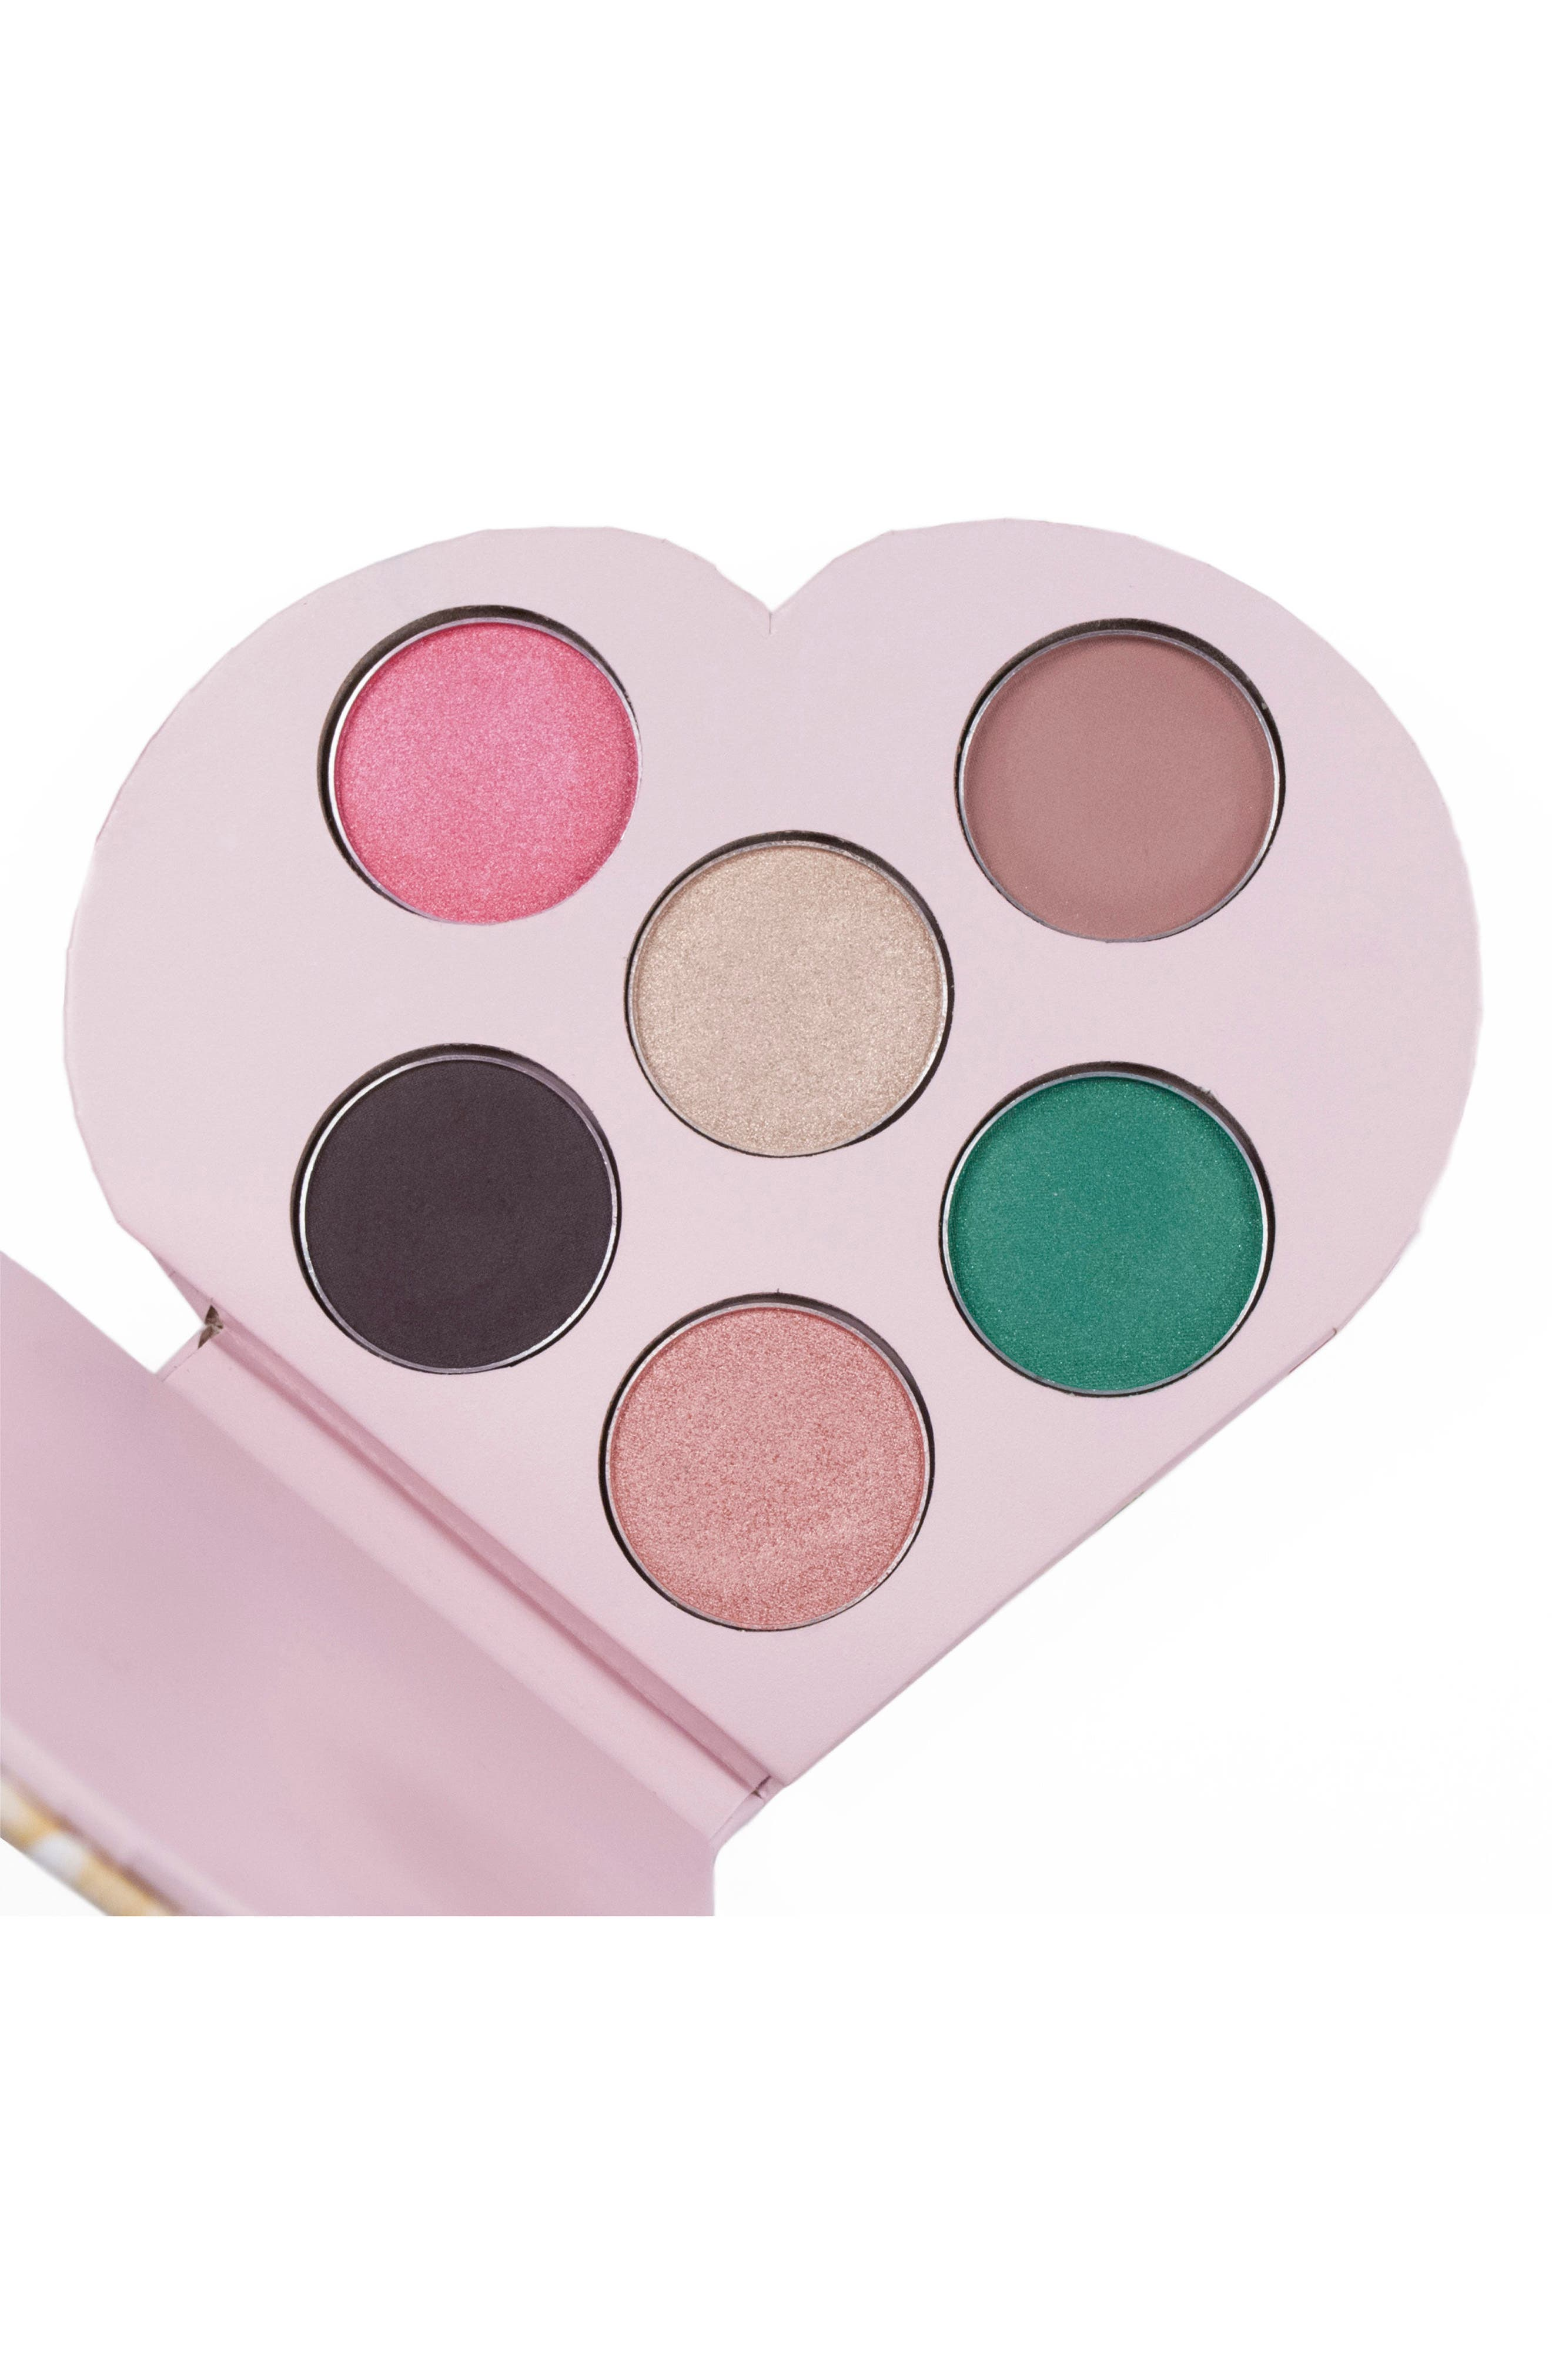 Smitten Heart Eyeshadow Palette,                             Alternate thumbnail 3, color,                             No Color